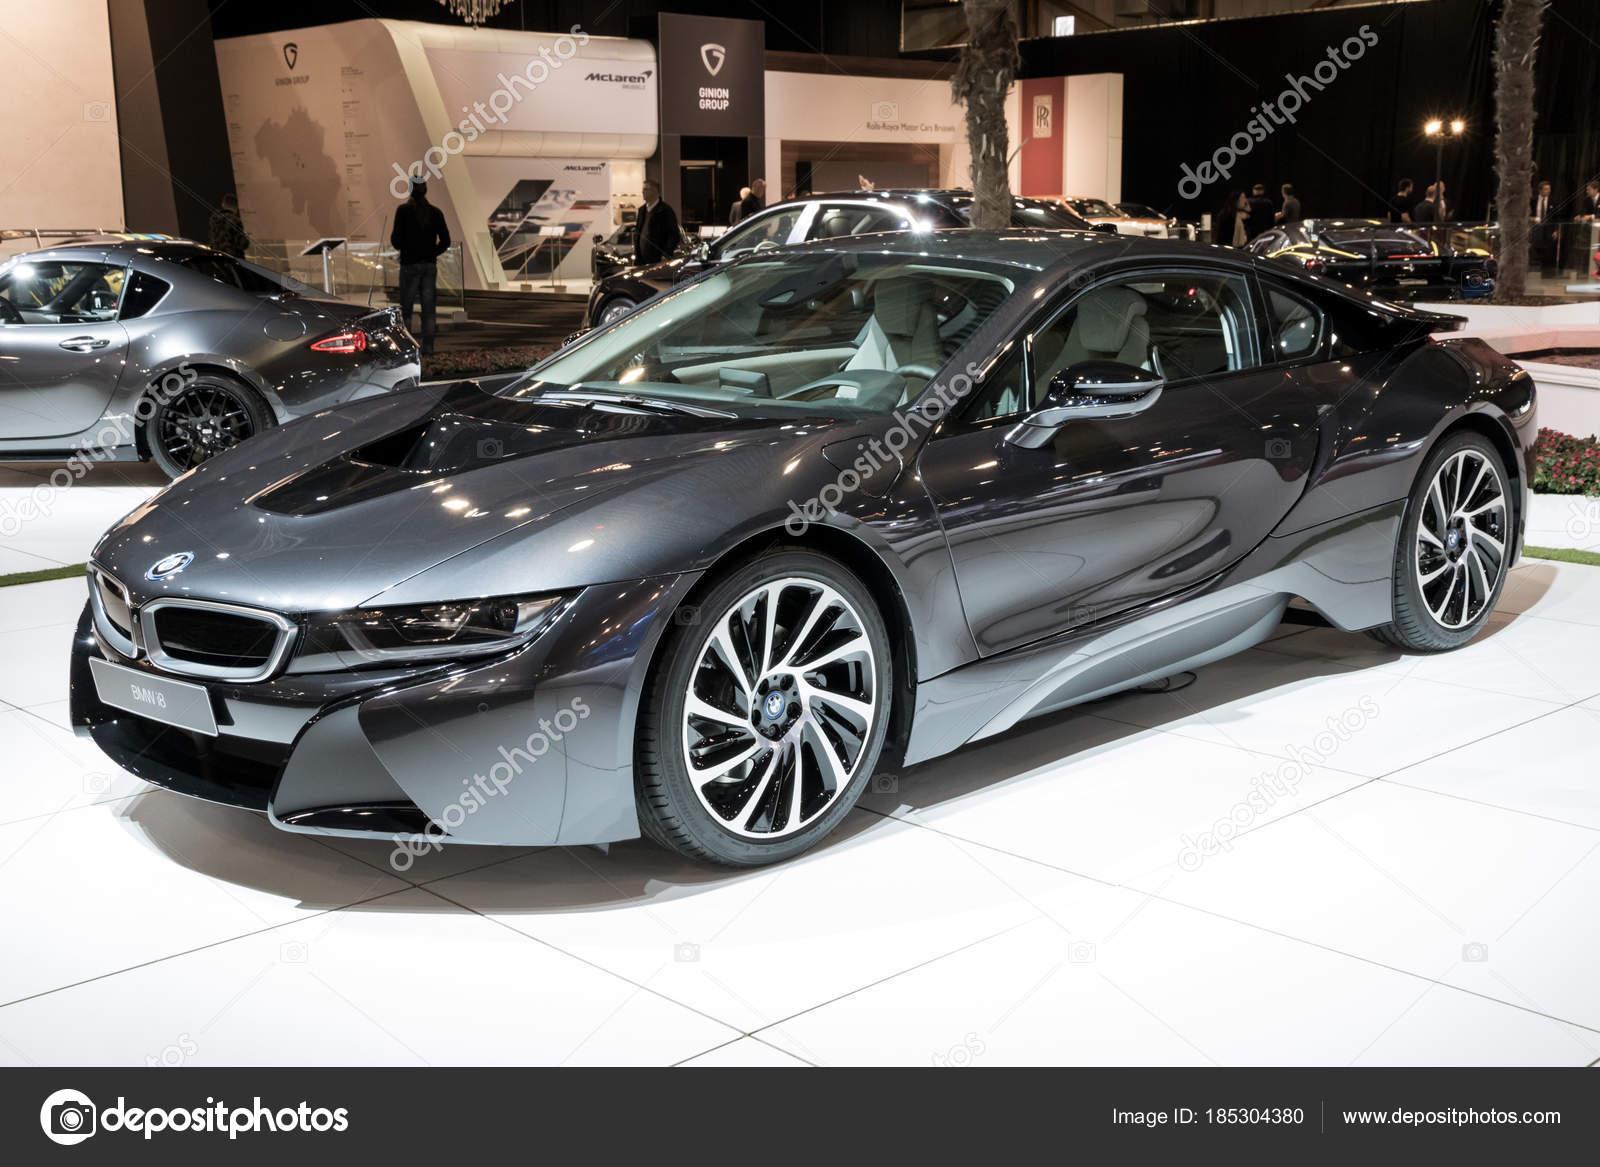 Bmw I8 Electric Sports Car Stock Editorial Photo C Foto Vdw 185304380